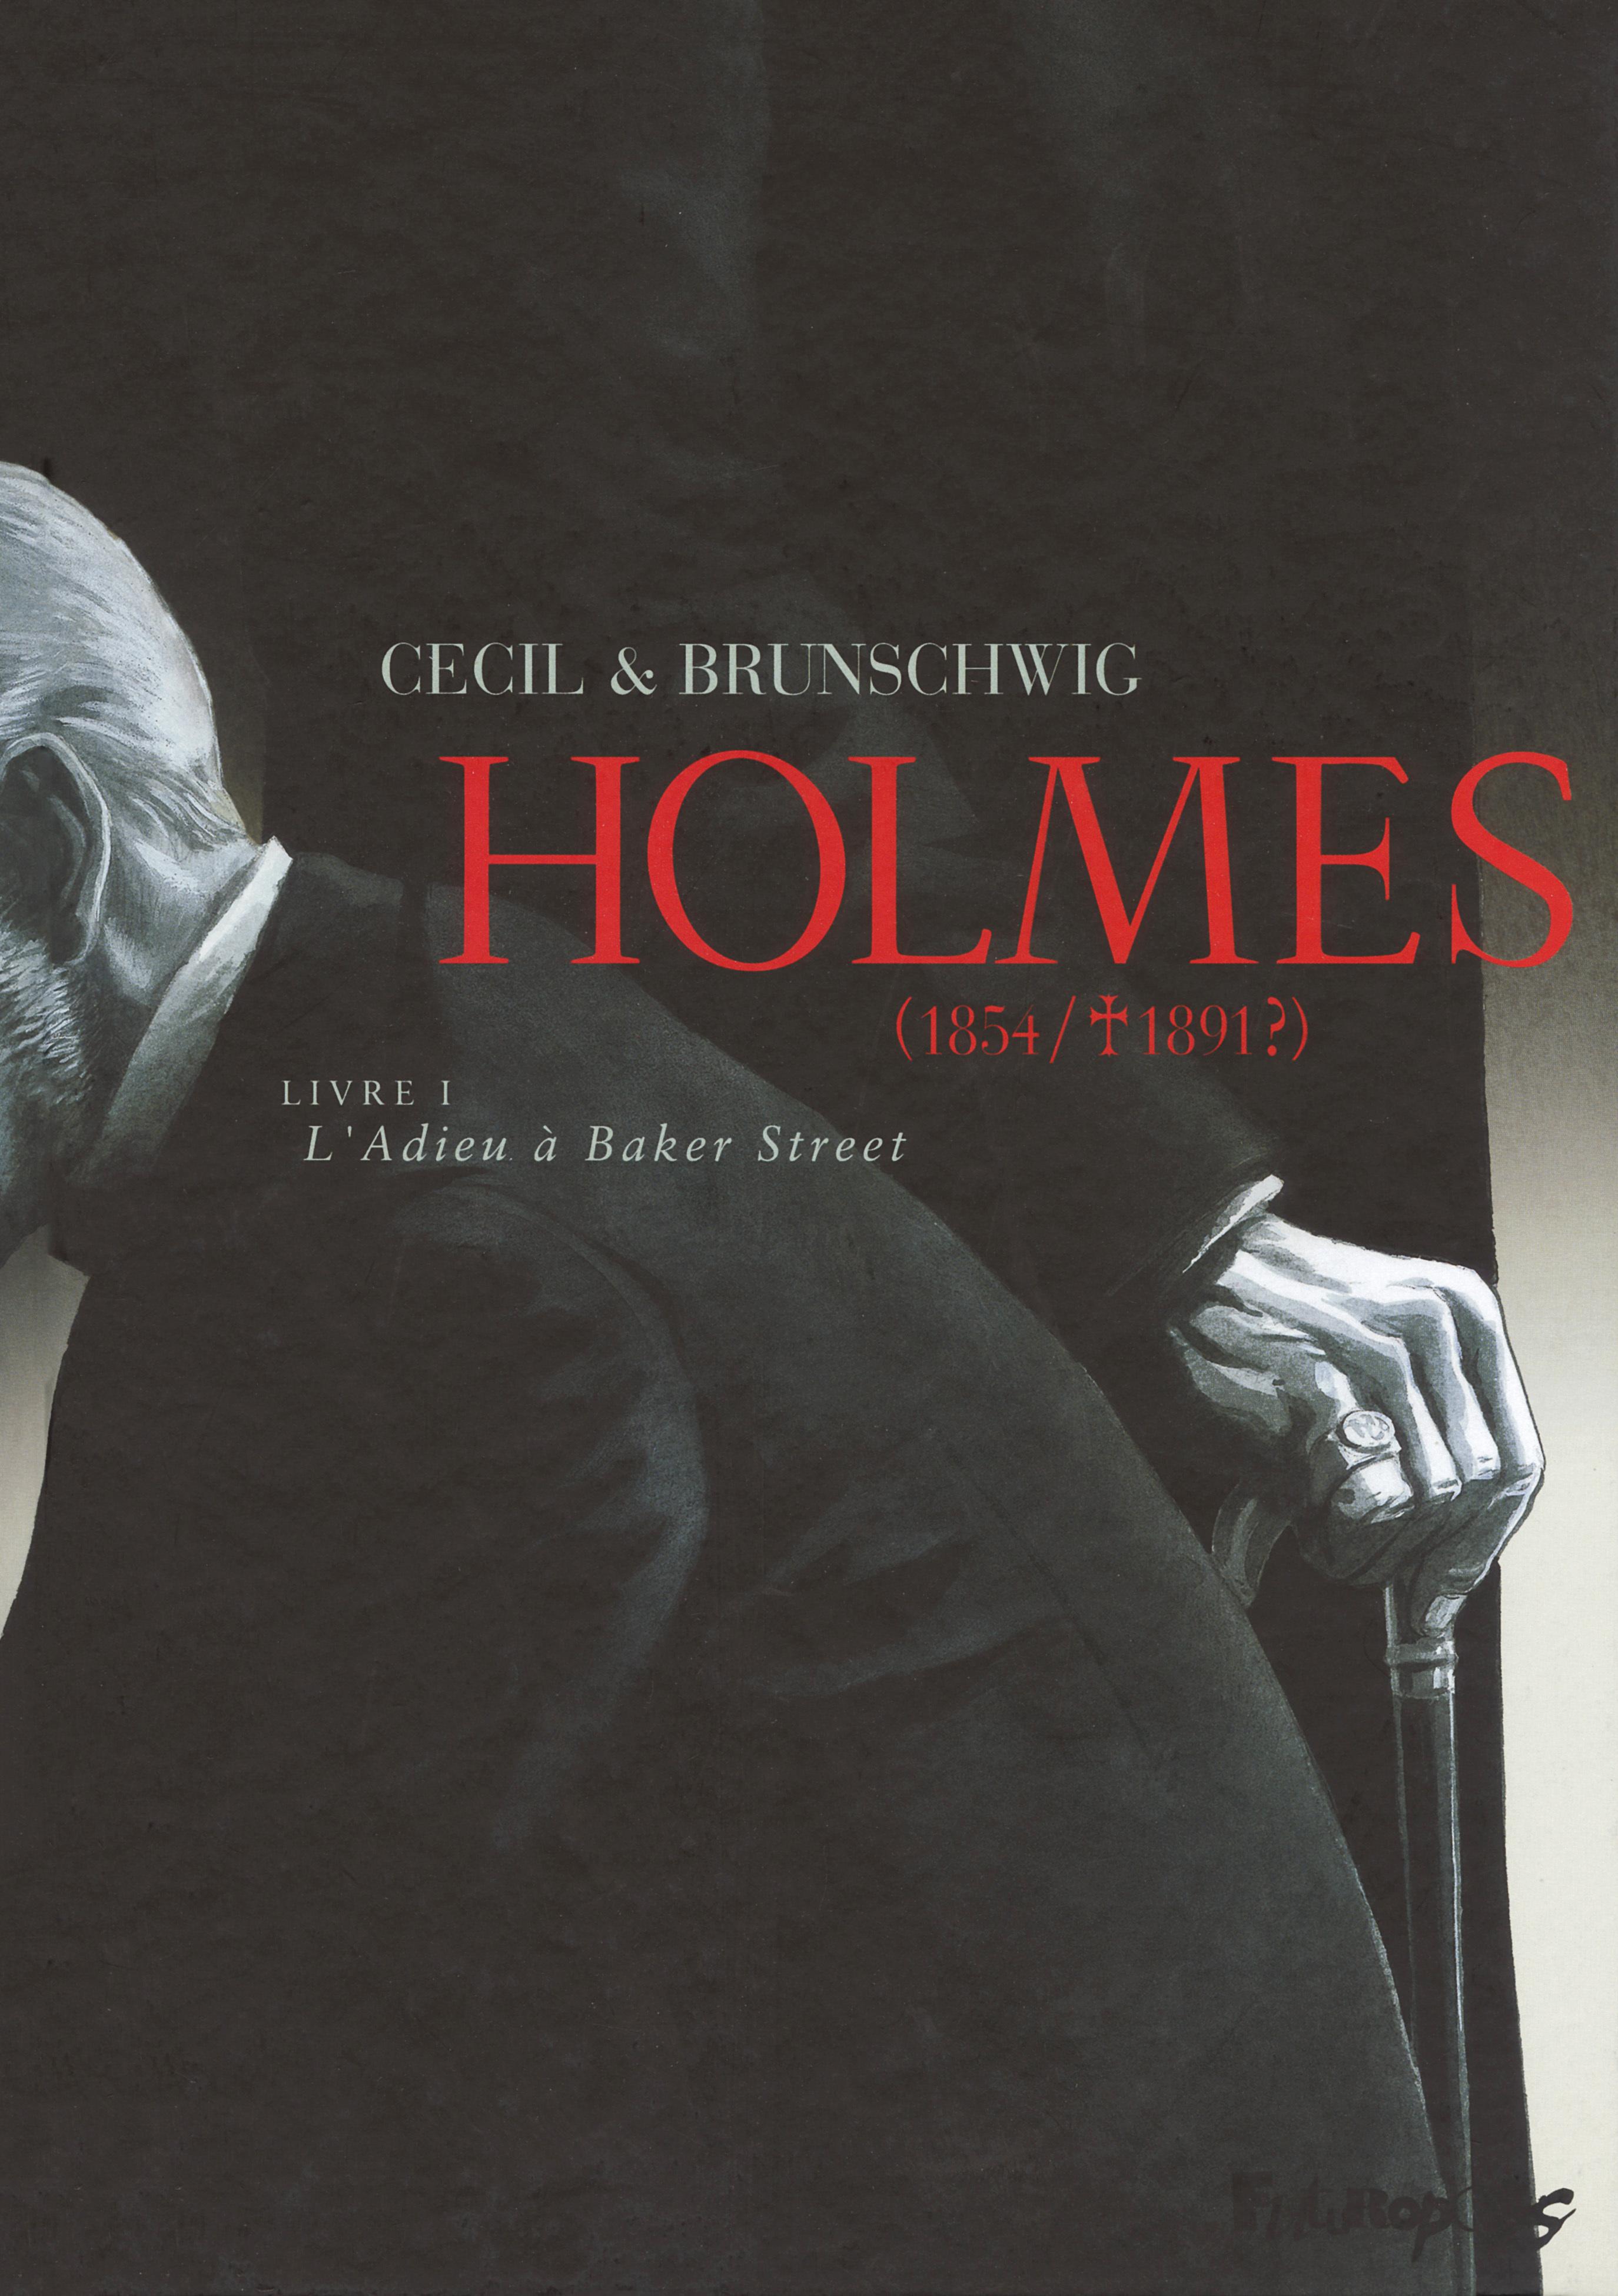 HOLMES (TOME 1-L'ADIEU A BAKER STREET) - (1854/  1891 ?)